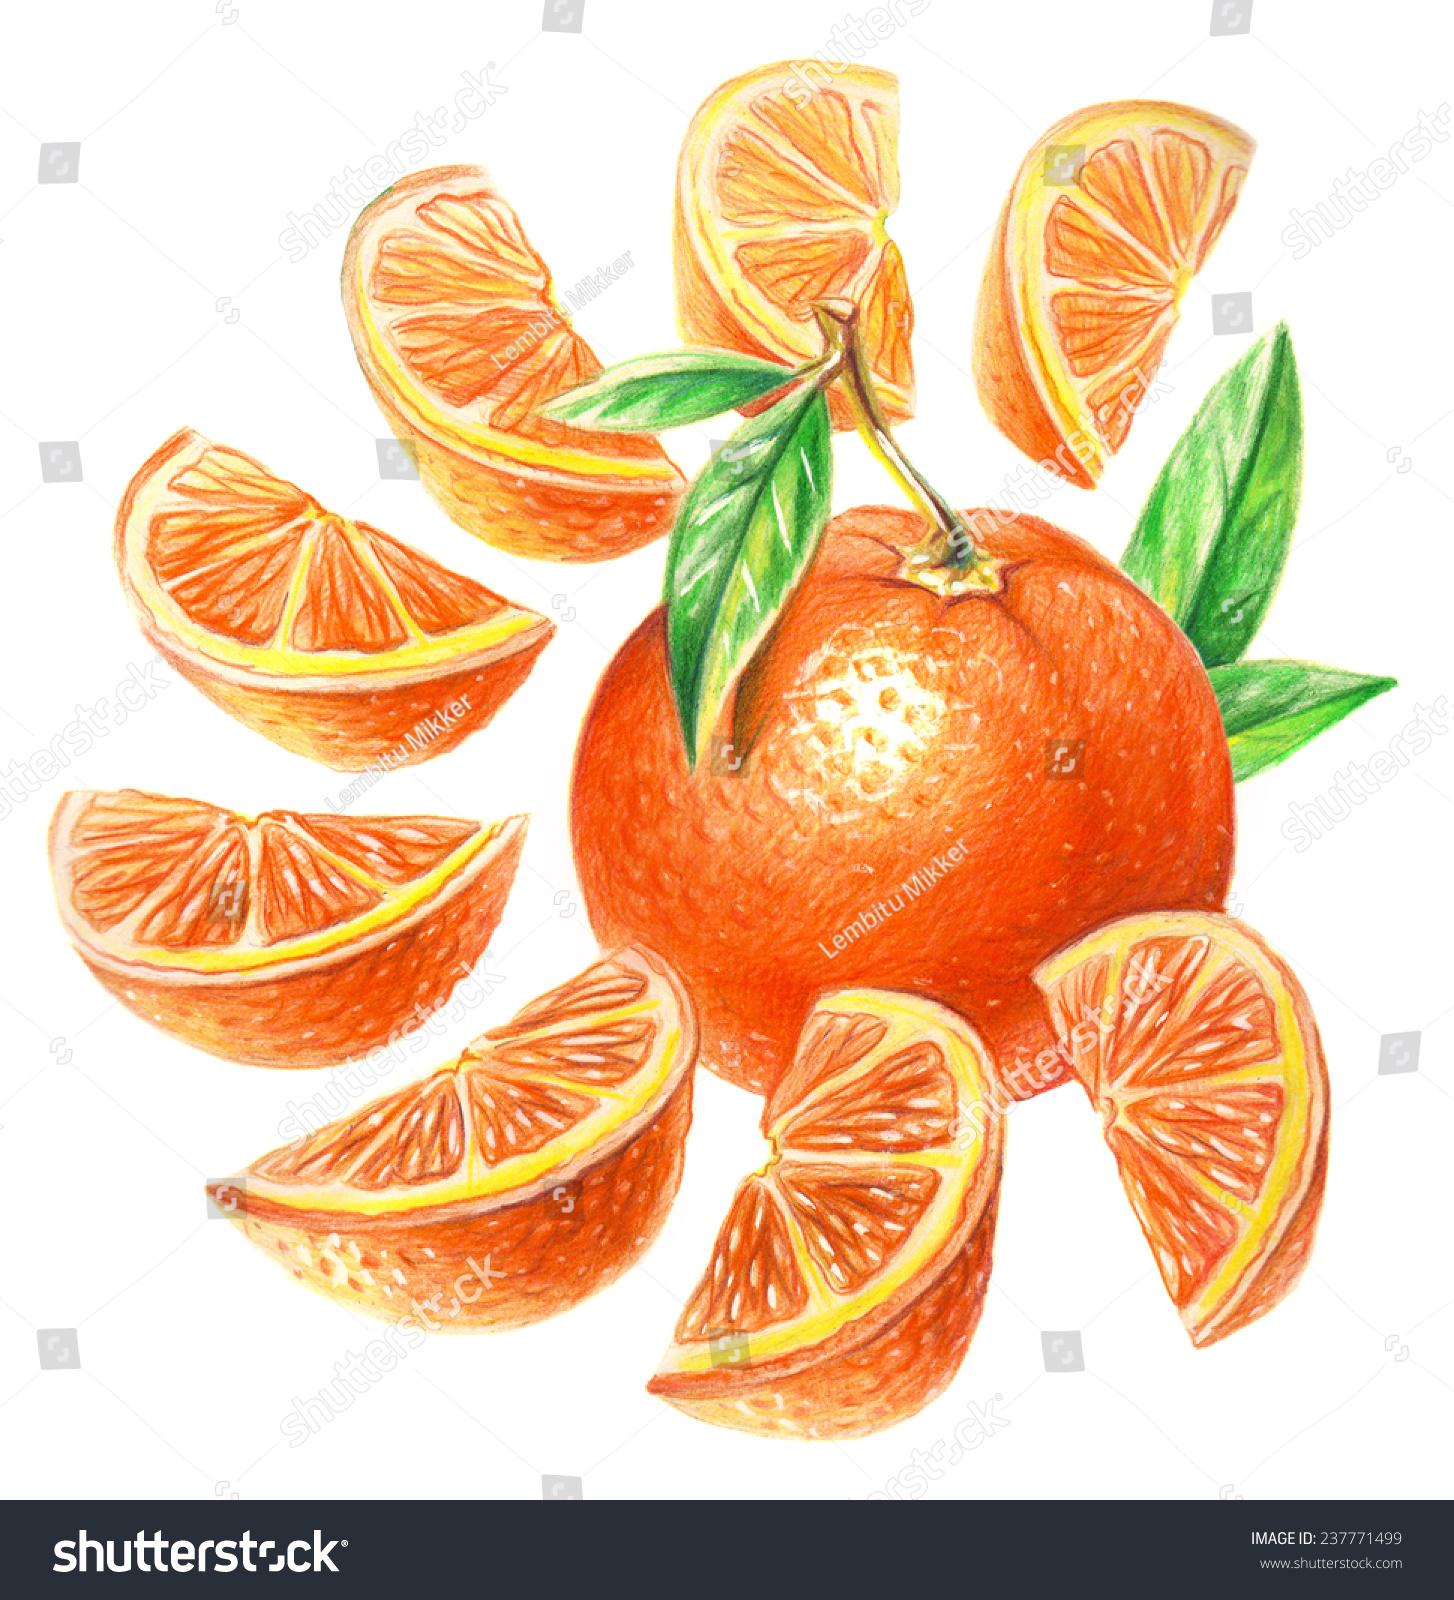 Pencil drawing orange slices stock illustration 237771499